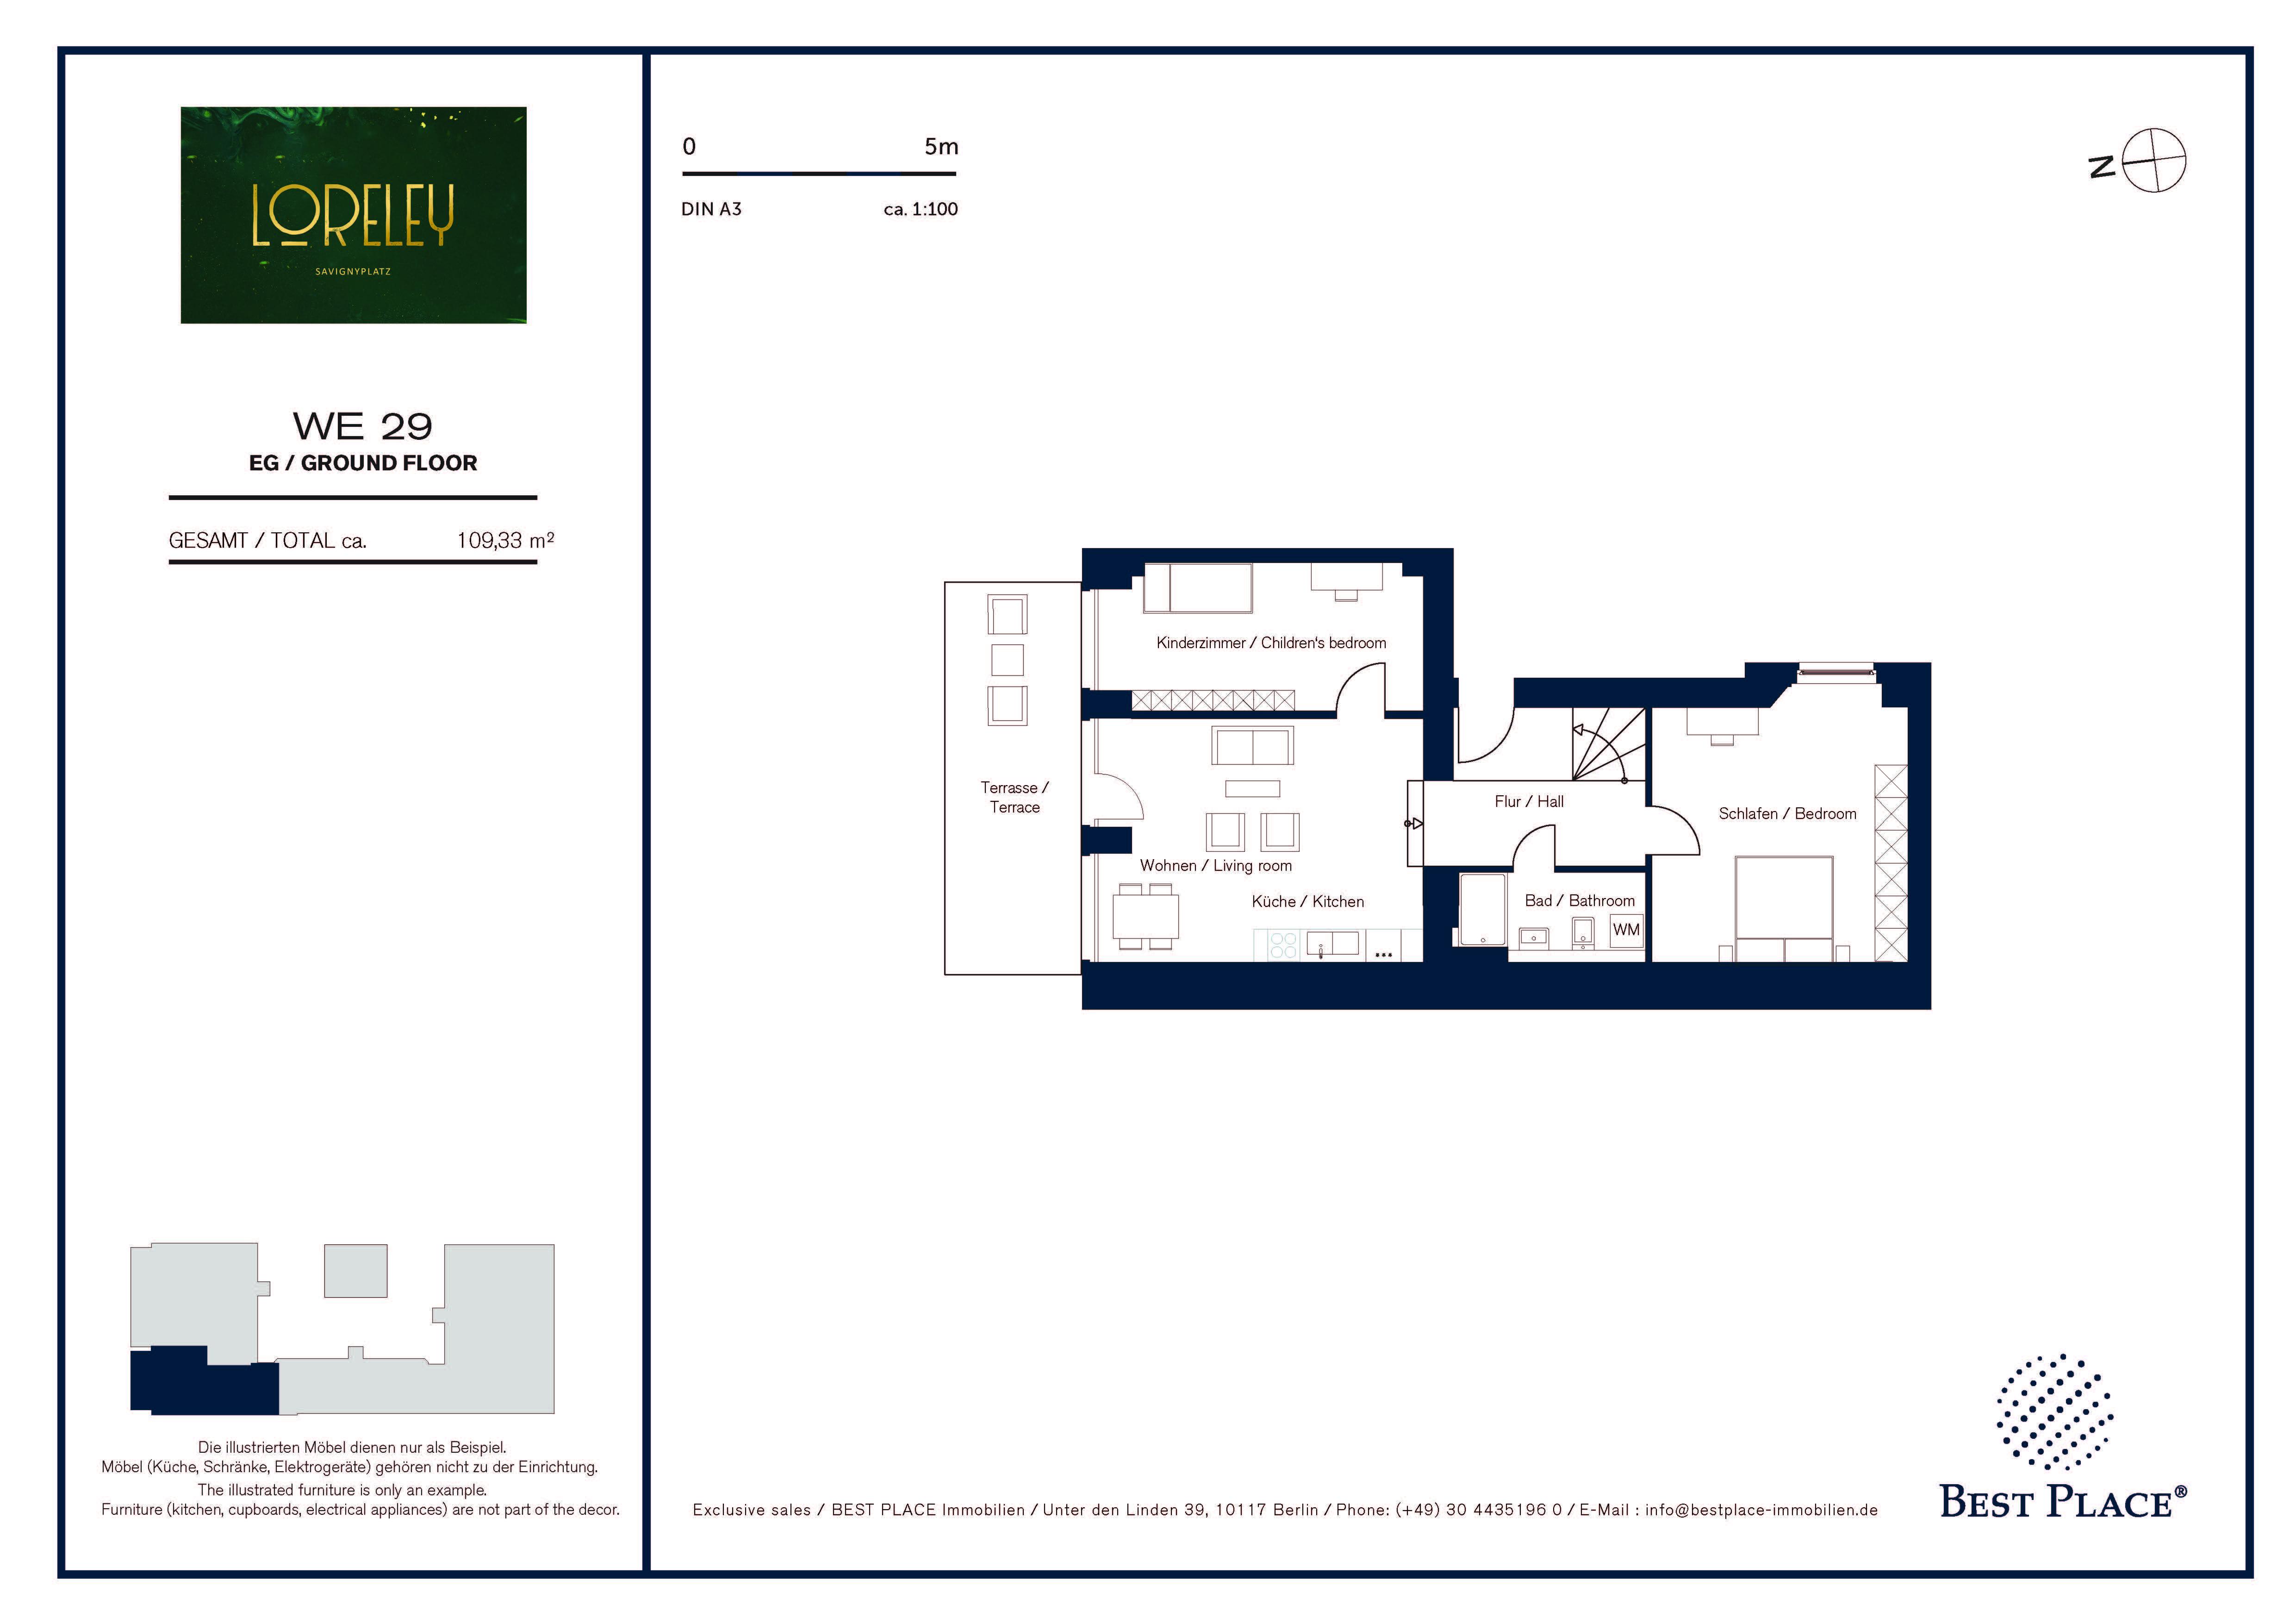 premium apartments in charlottenburg - best place immobilien